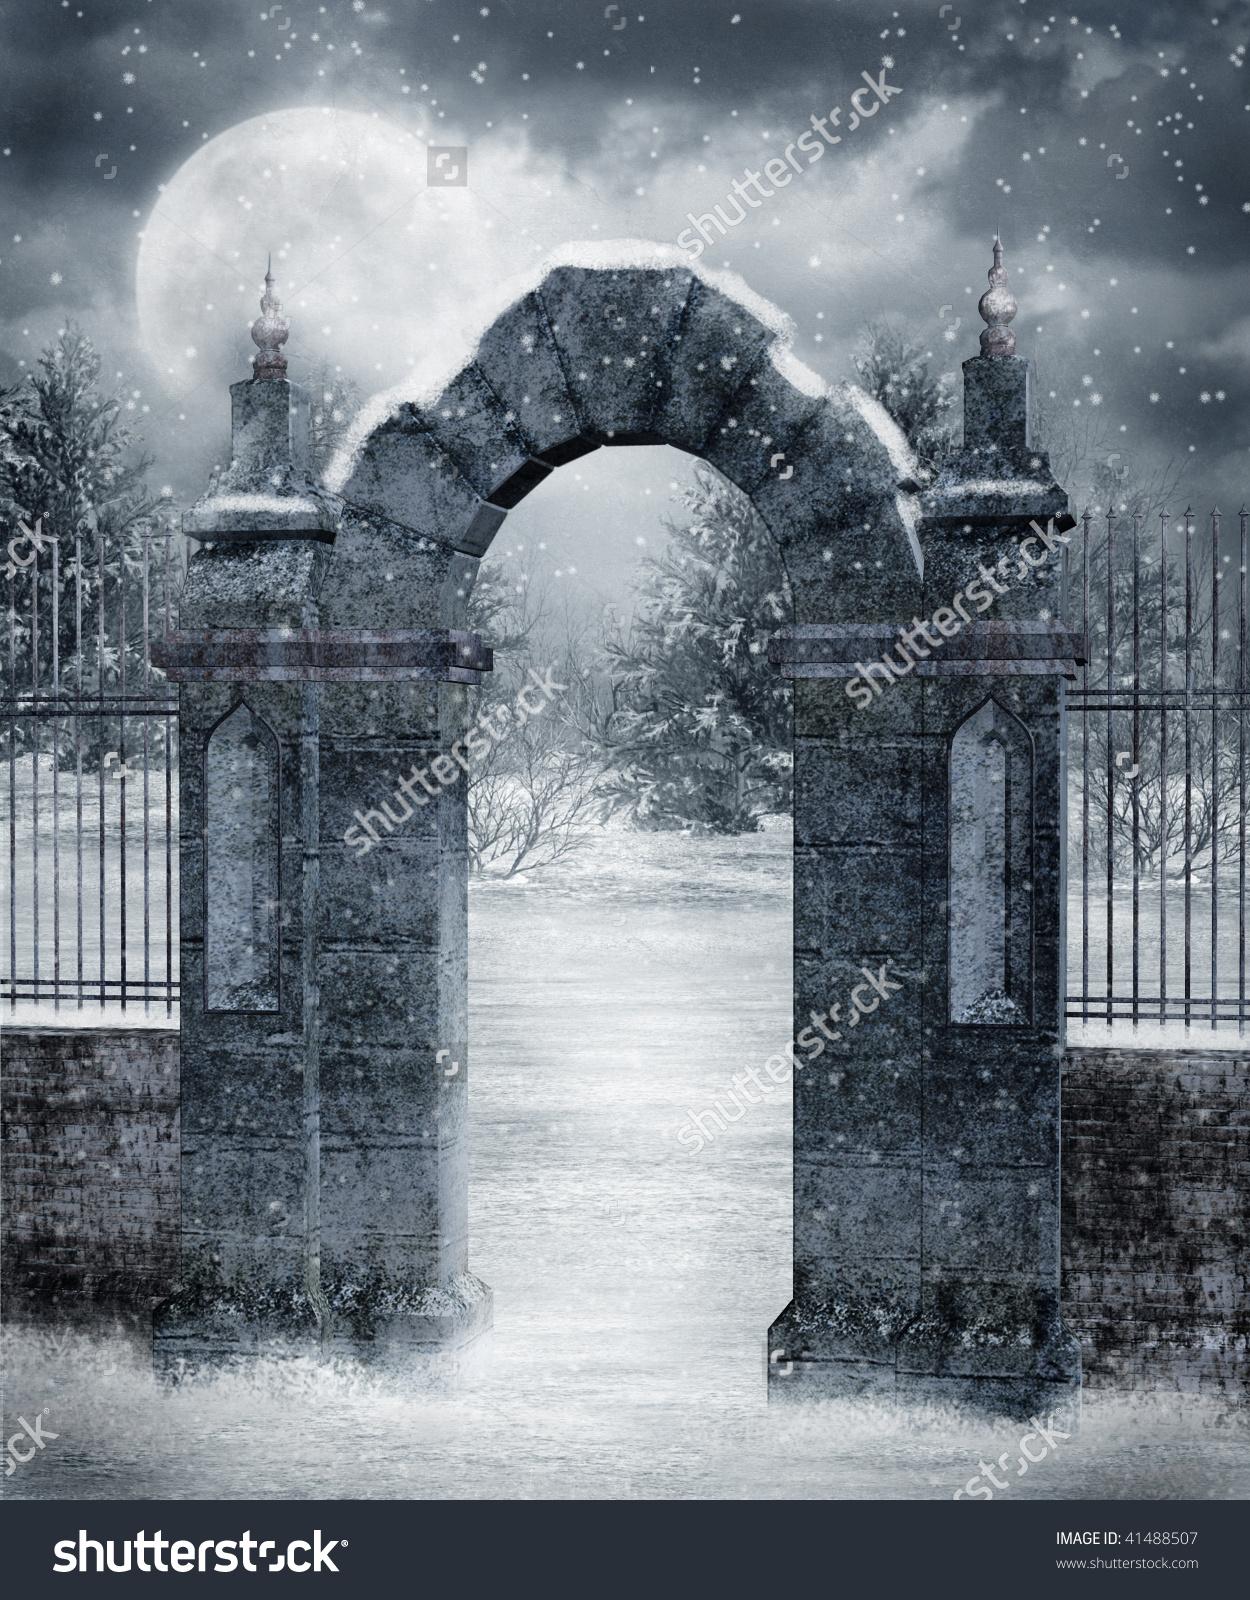 Gate clipart cemetery gates (15+) cemetery Gate Graveyard clipart